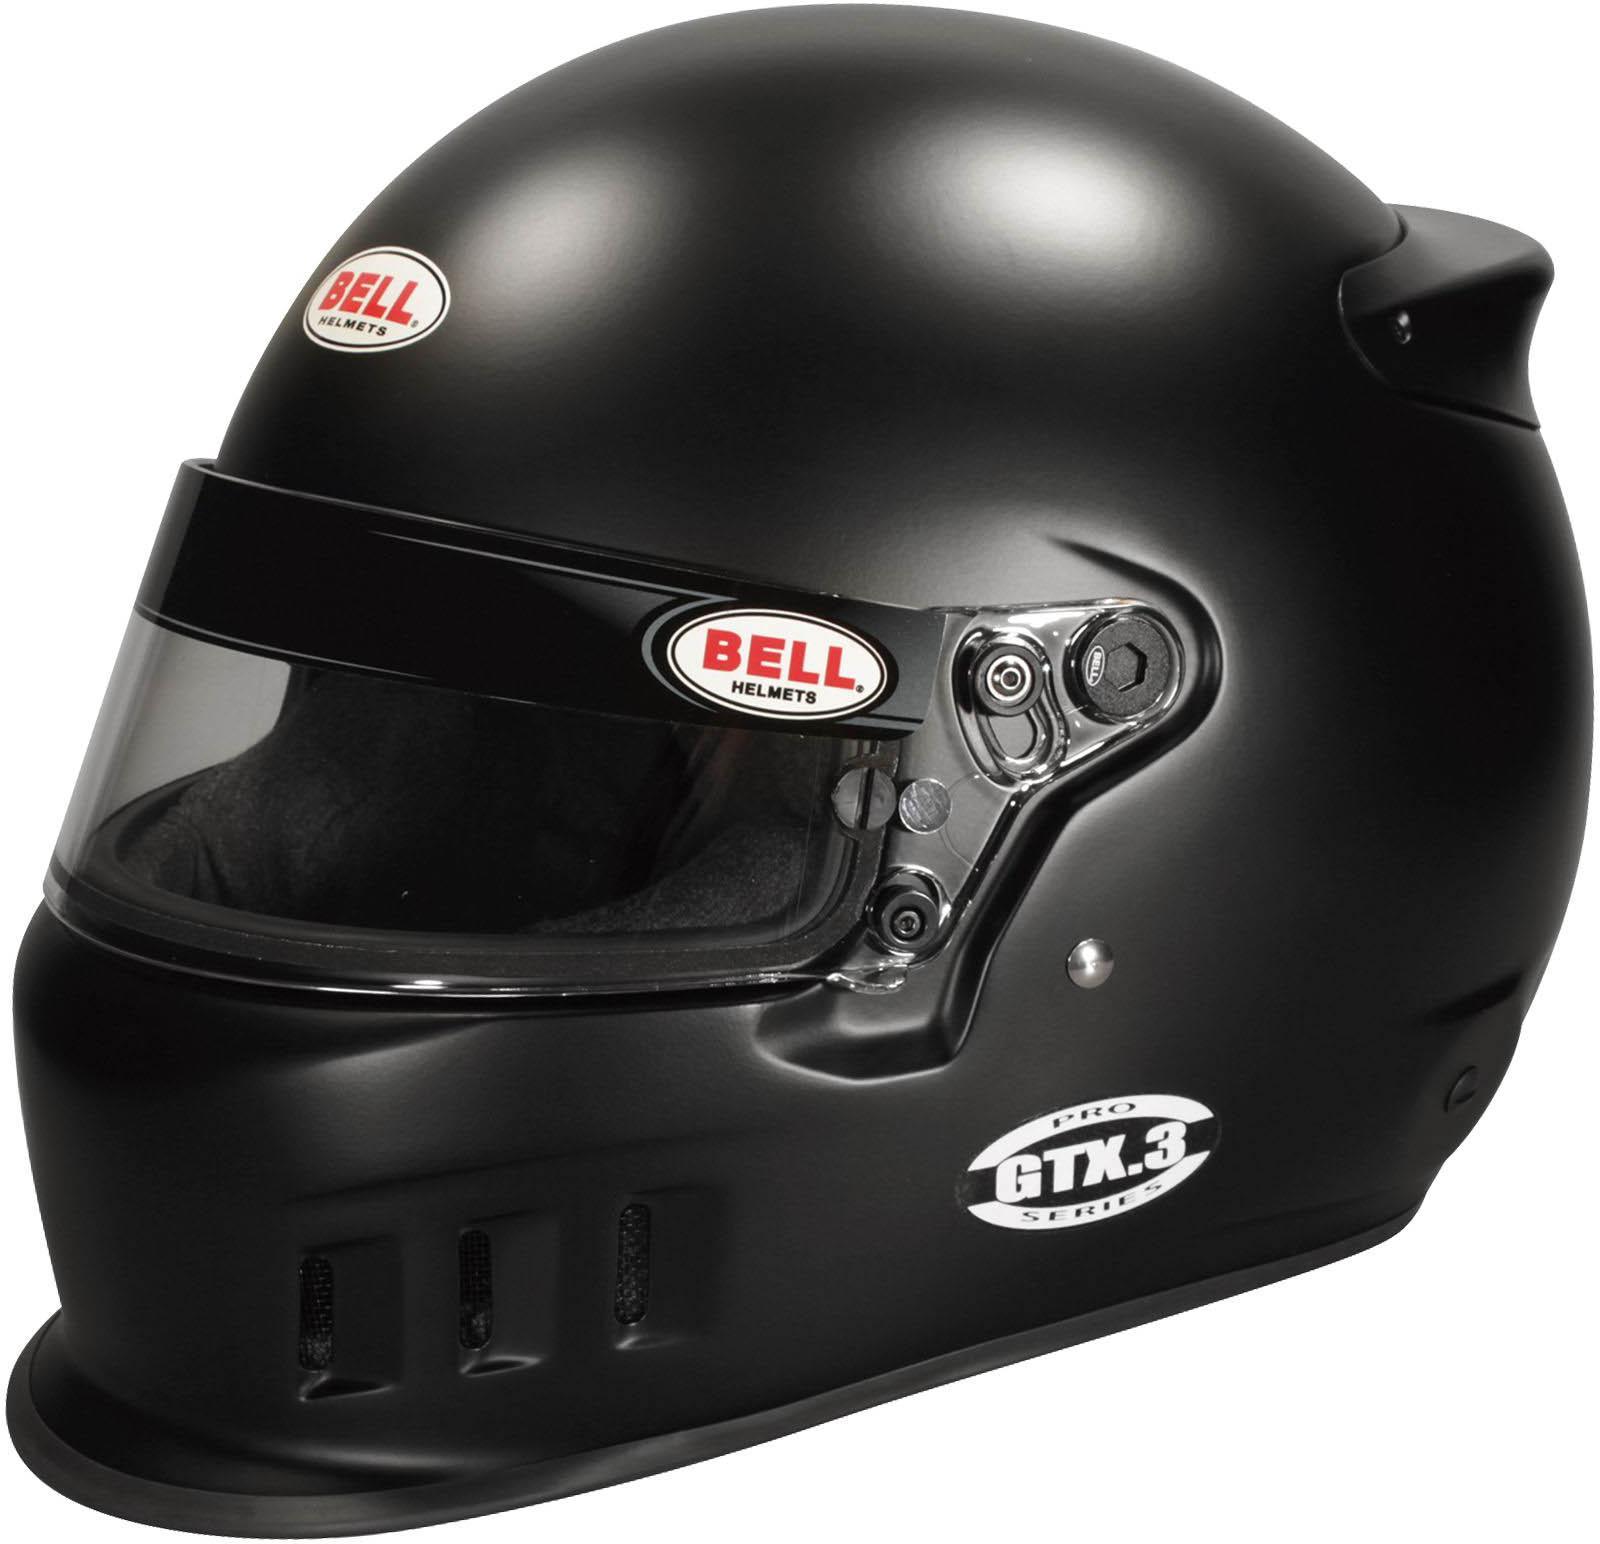 Bell GTX3 Composite Helmet SA2020